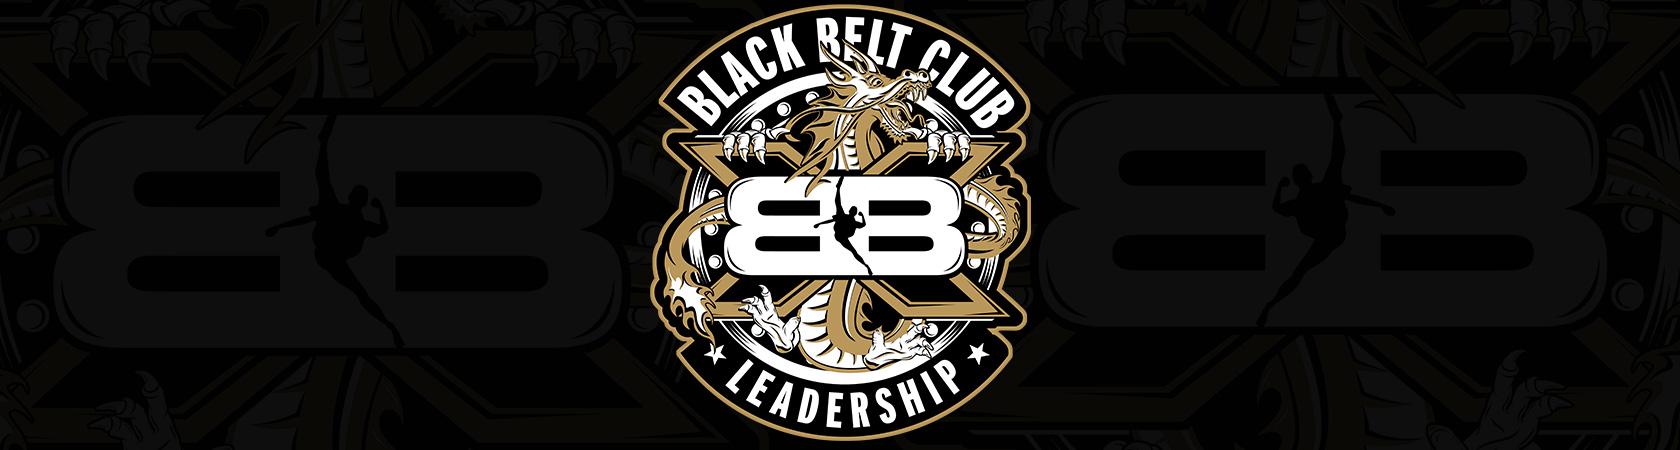 Black Belt club